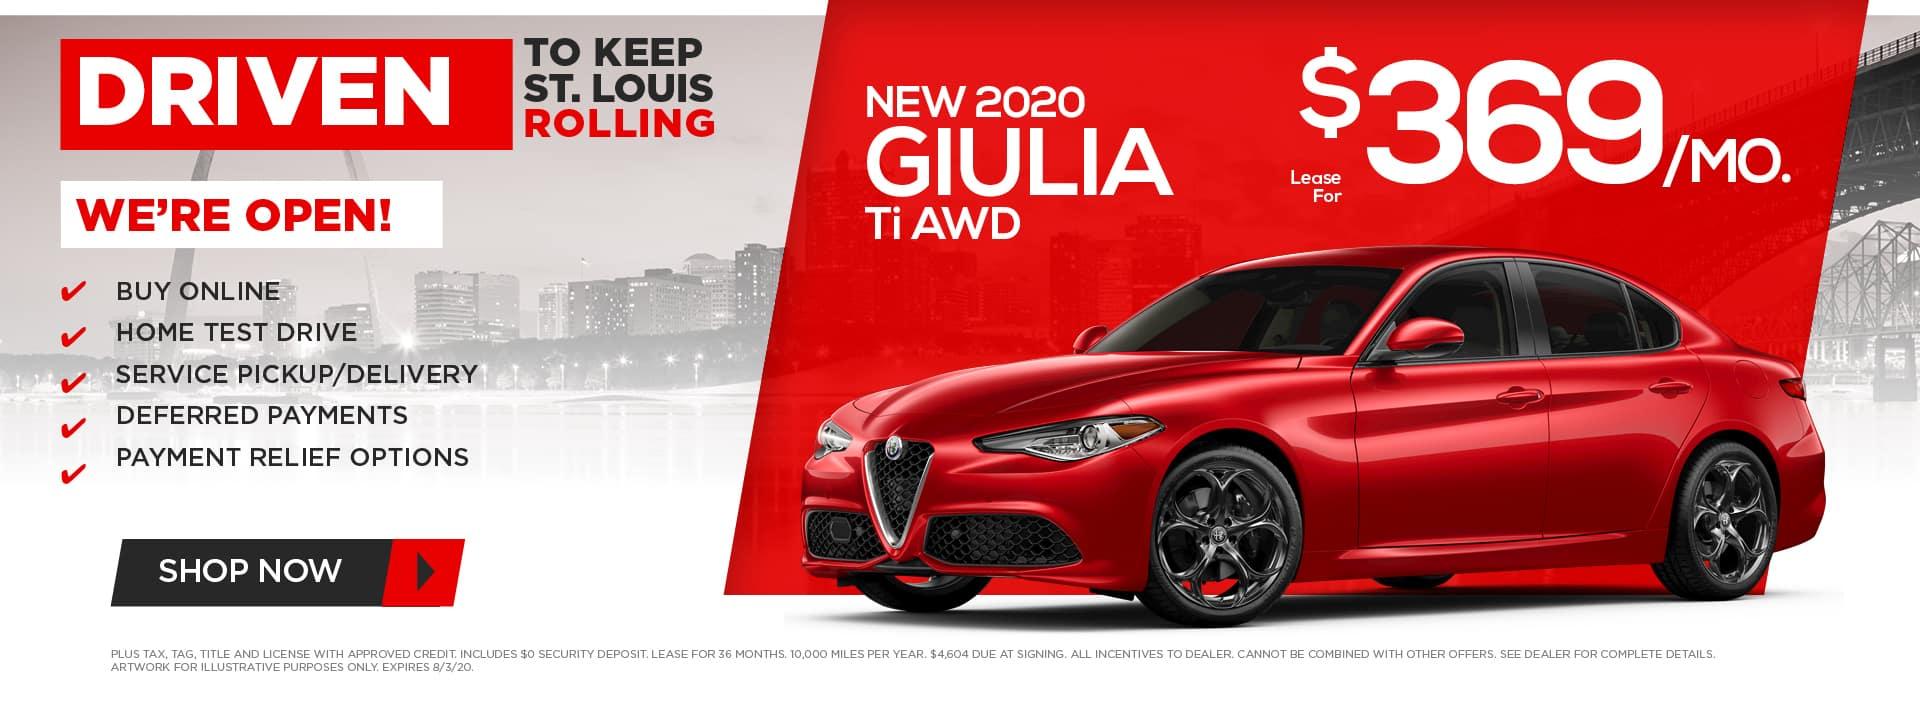 New Giulia Ti